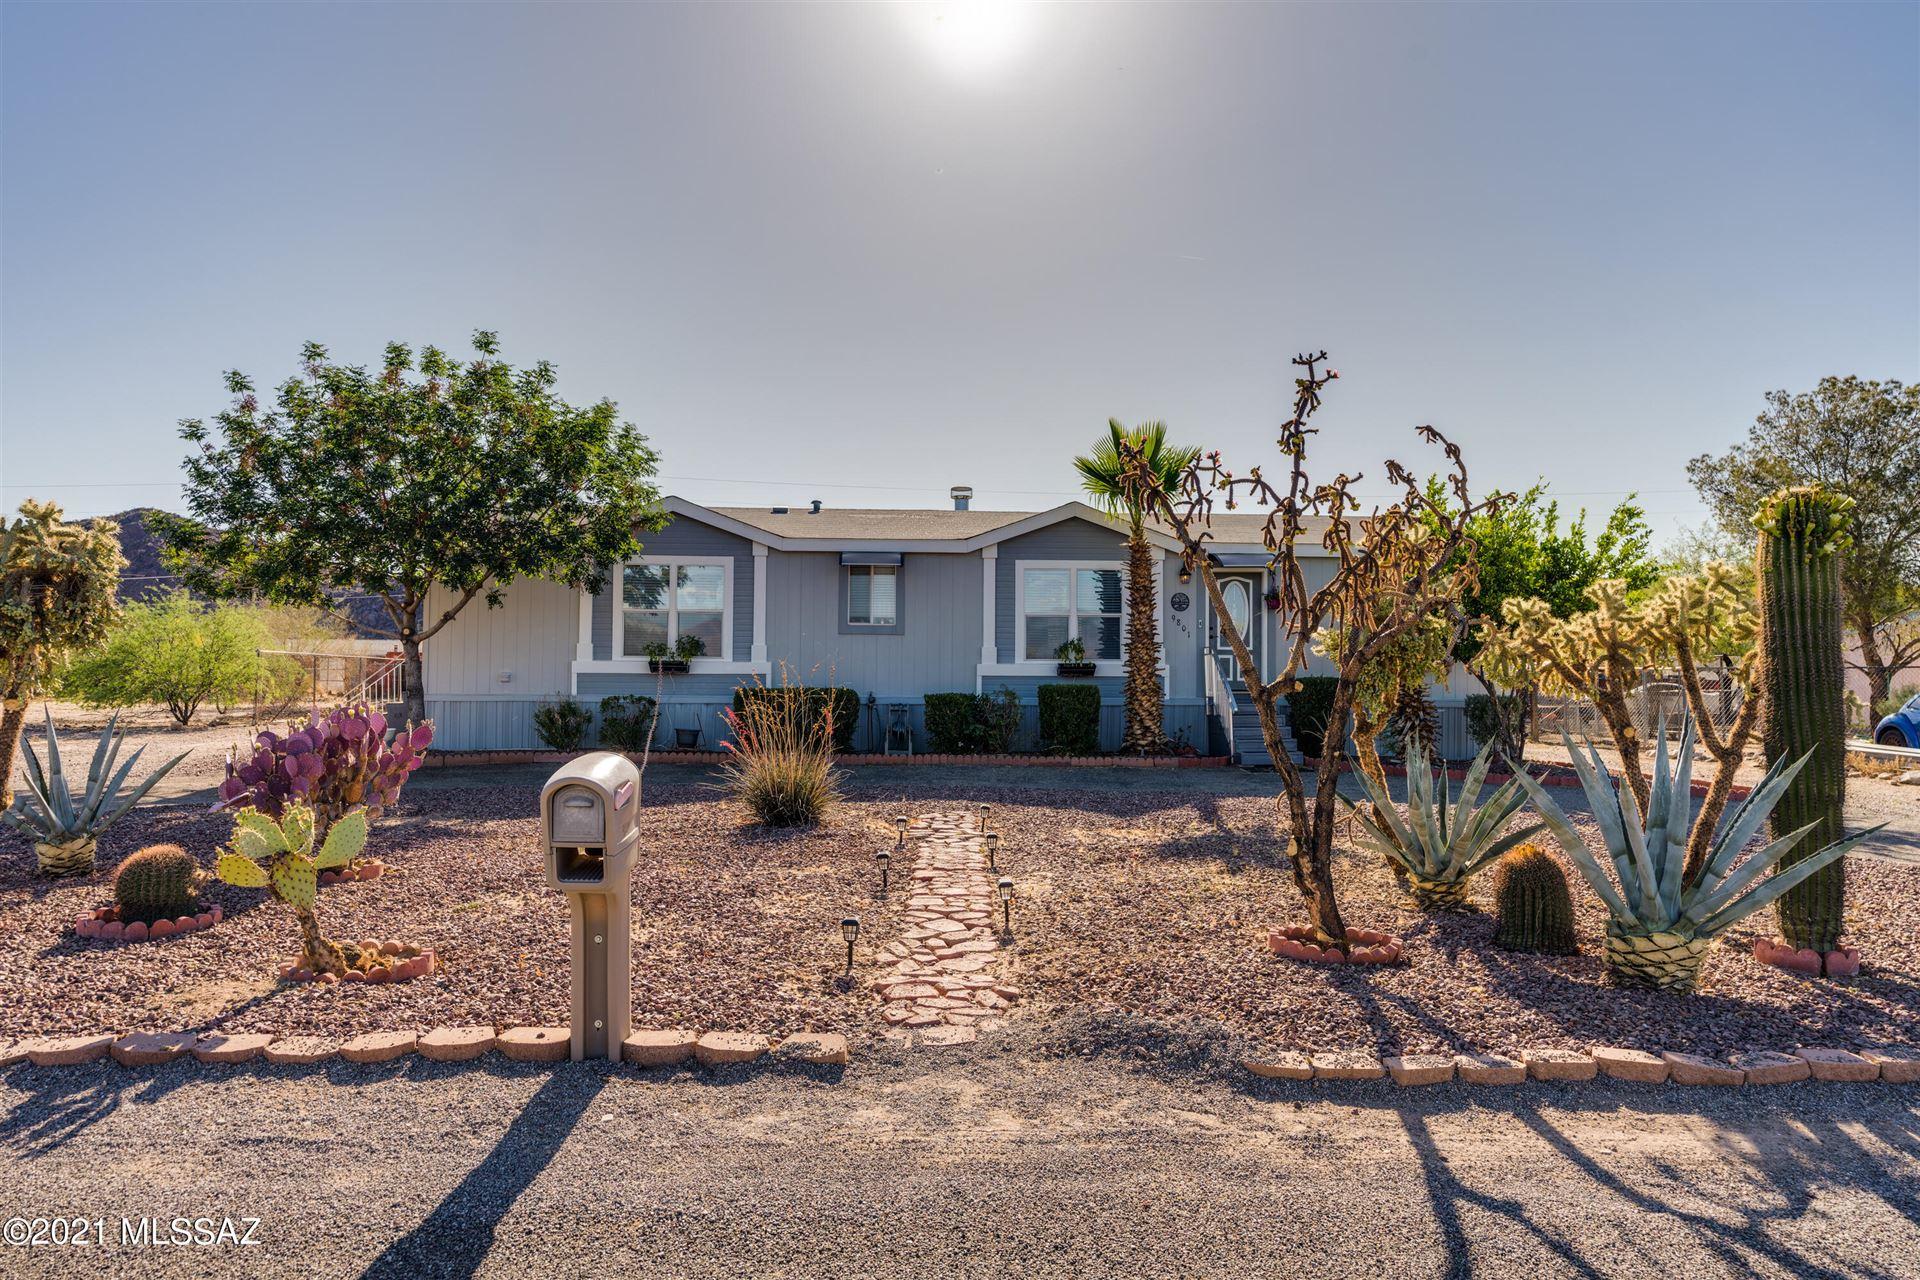 9801 N El Uno Gordo, Tucson, AZ 85743 - MLS#: 22112146